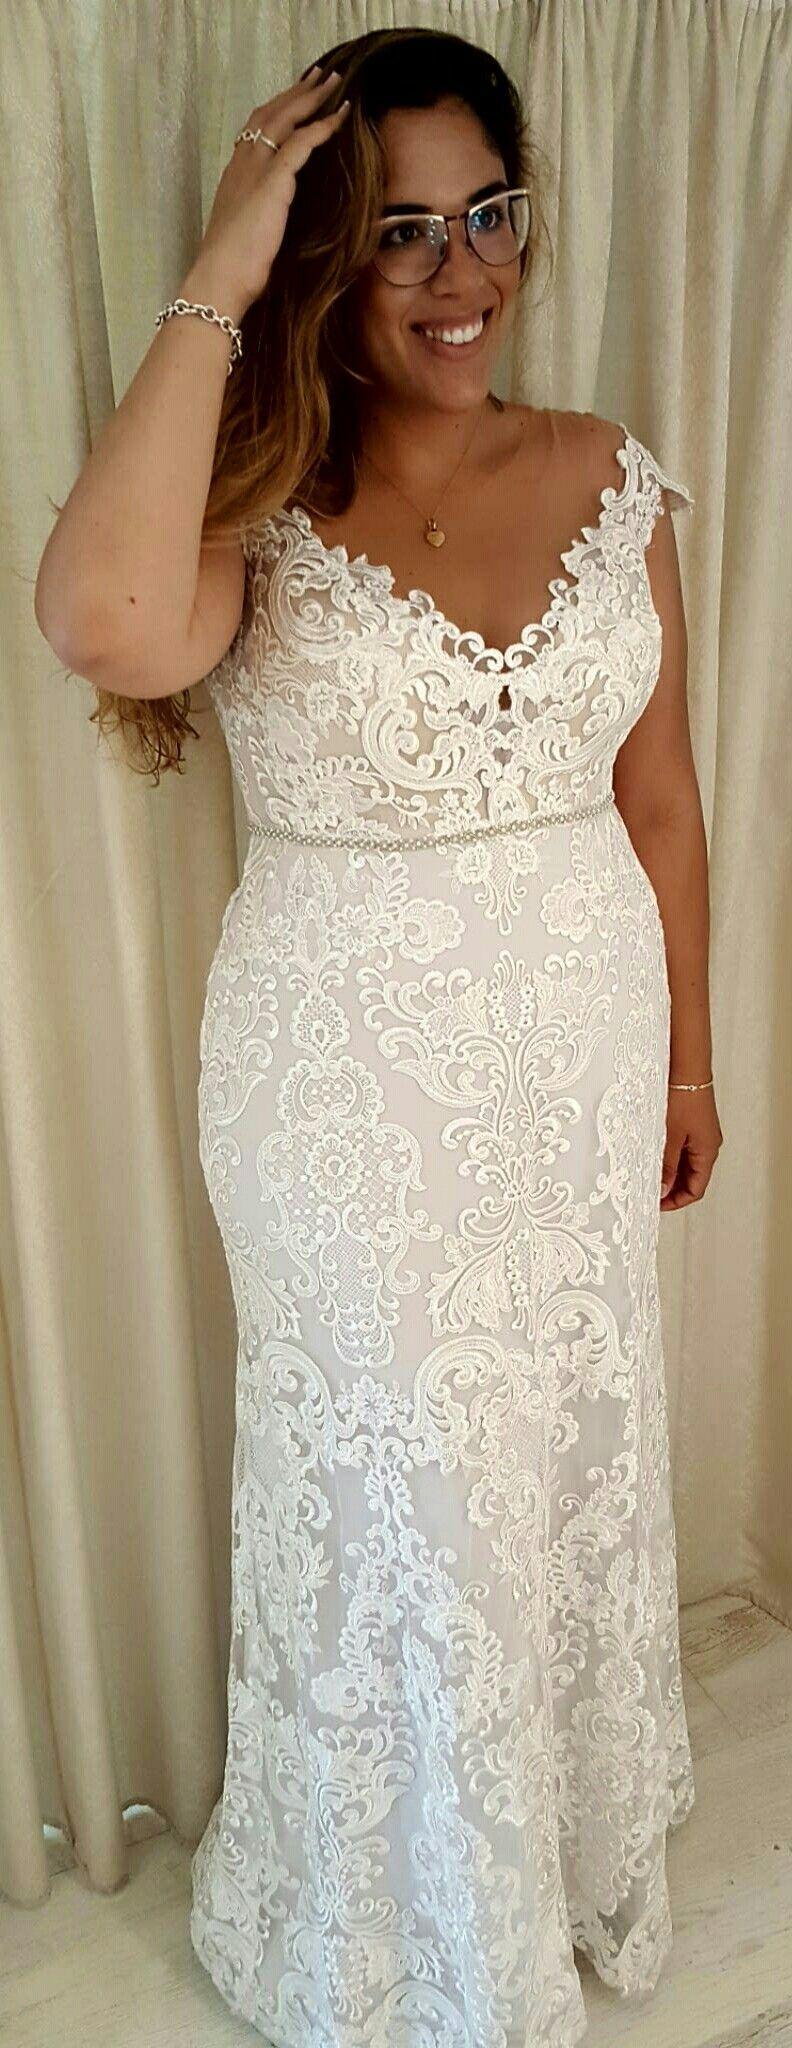 Wedding dresses for curvy brides  Plus size bride in Adel lace mermaid gown Studio Levana